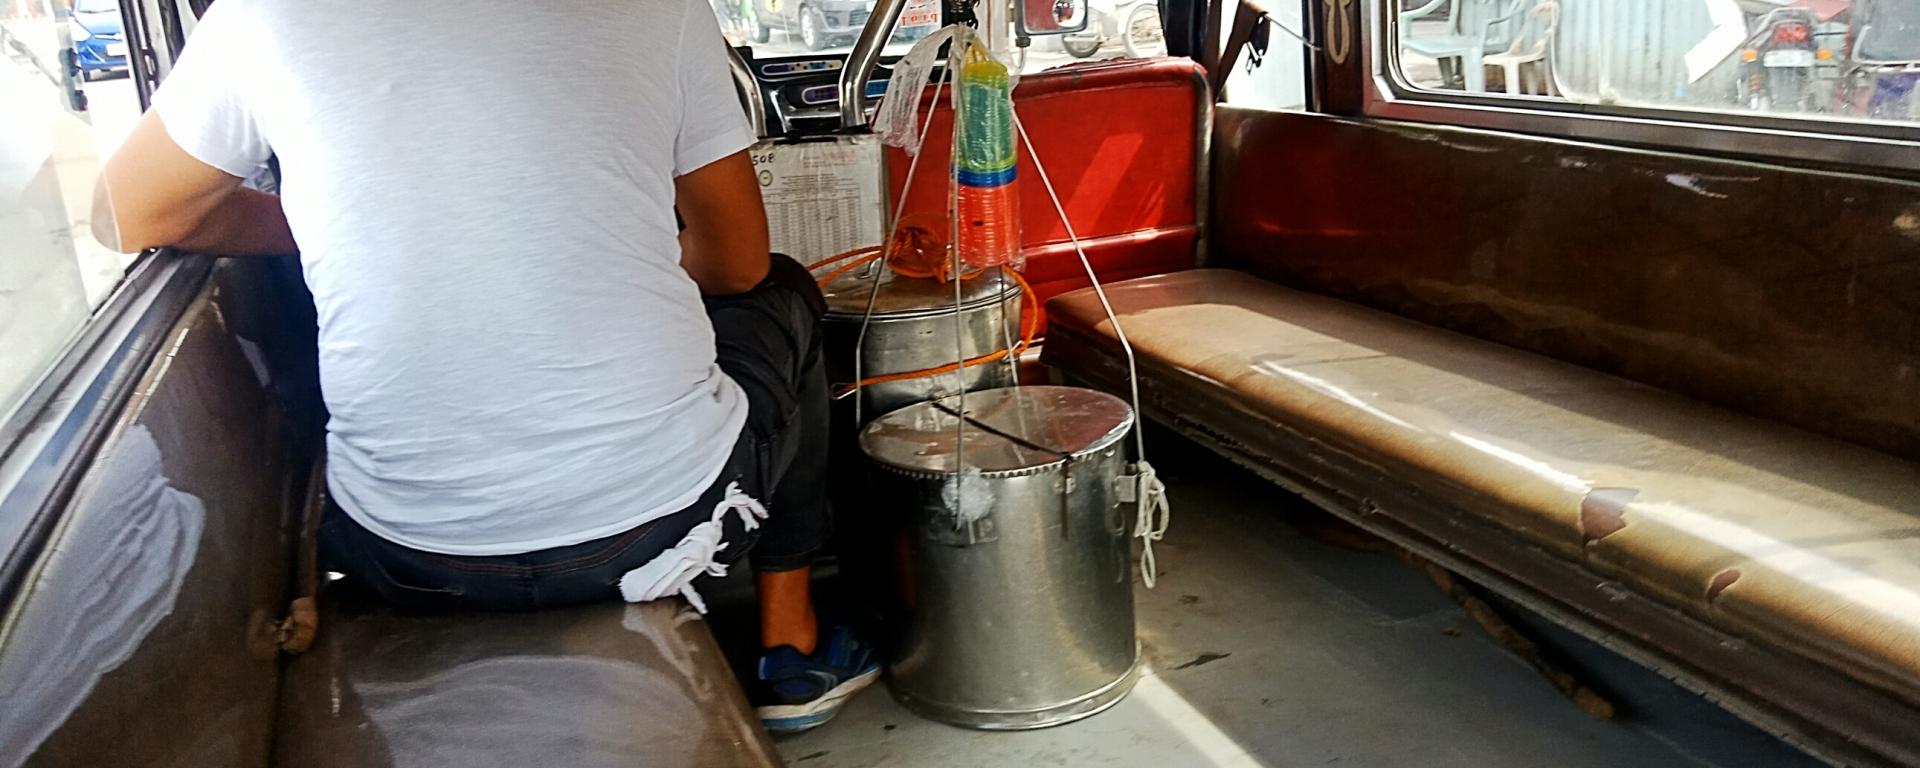 Taho magtataho, taho vendor peddler jeepney